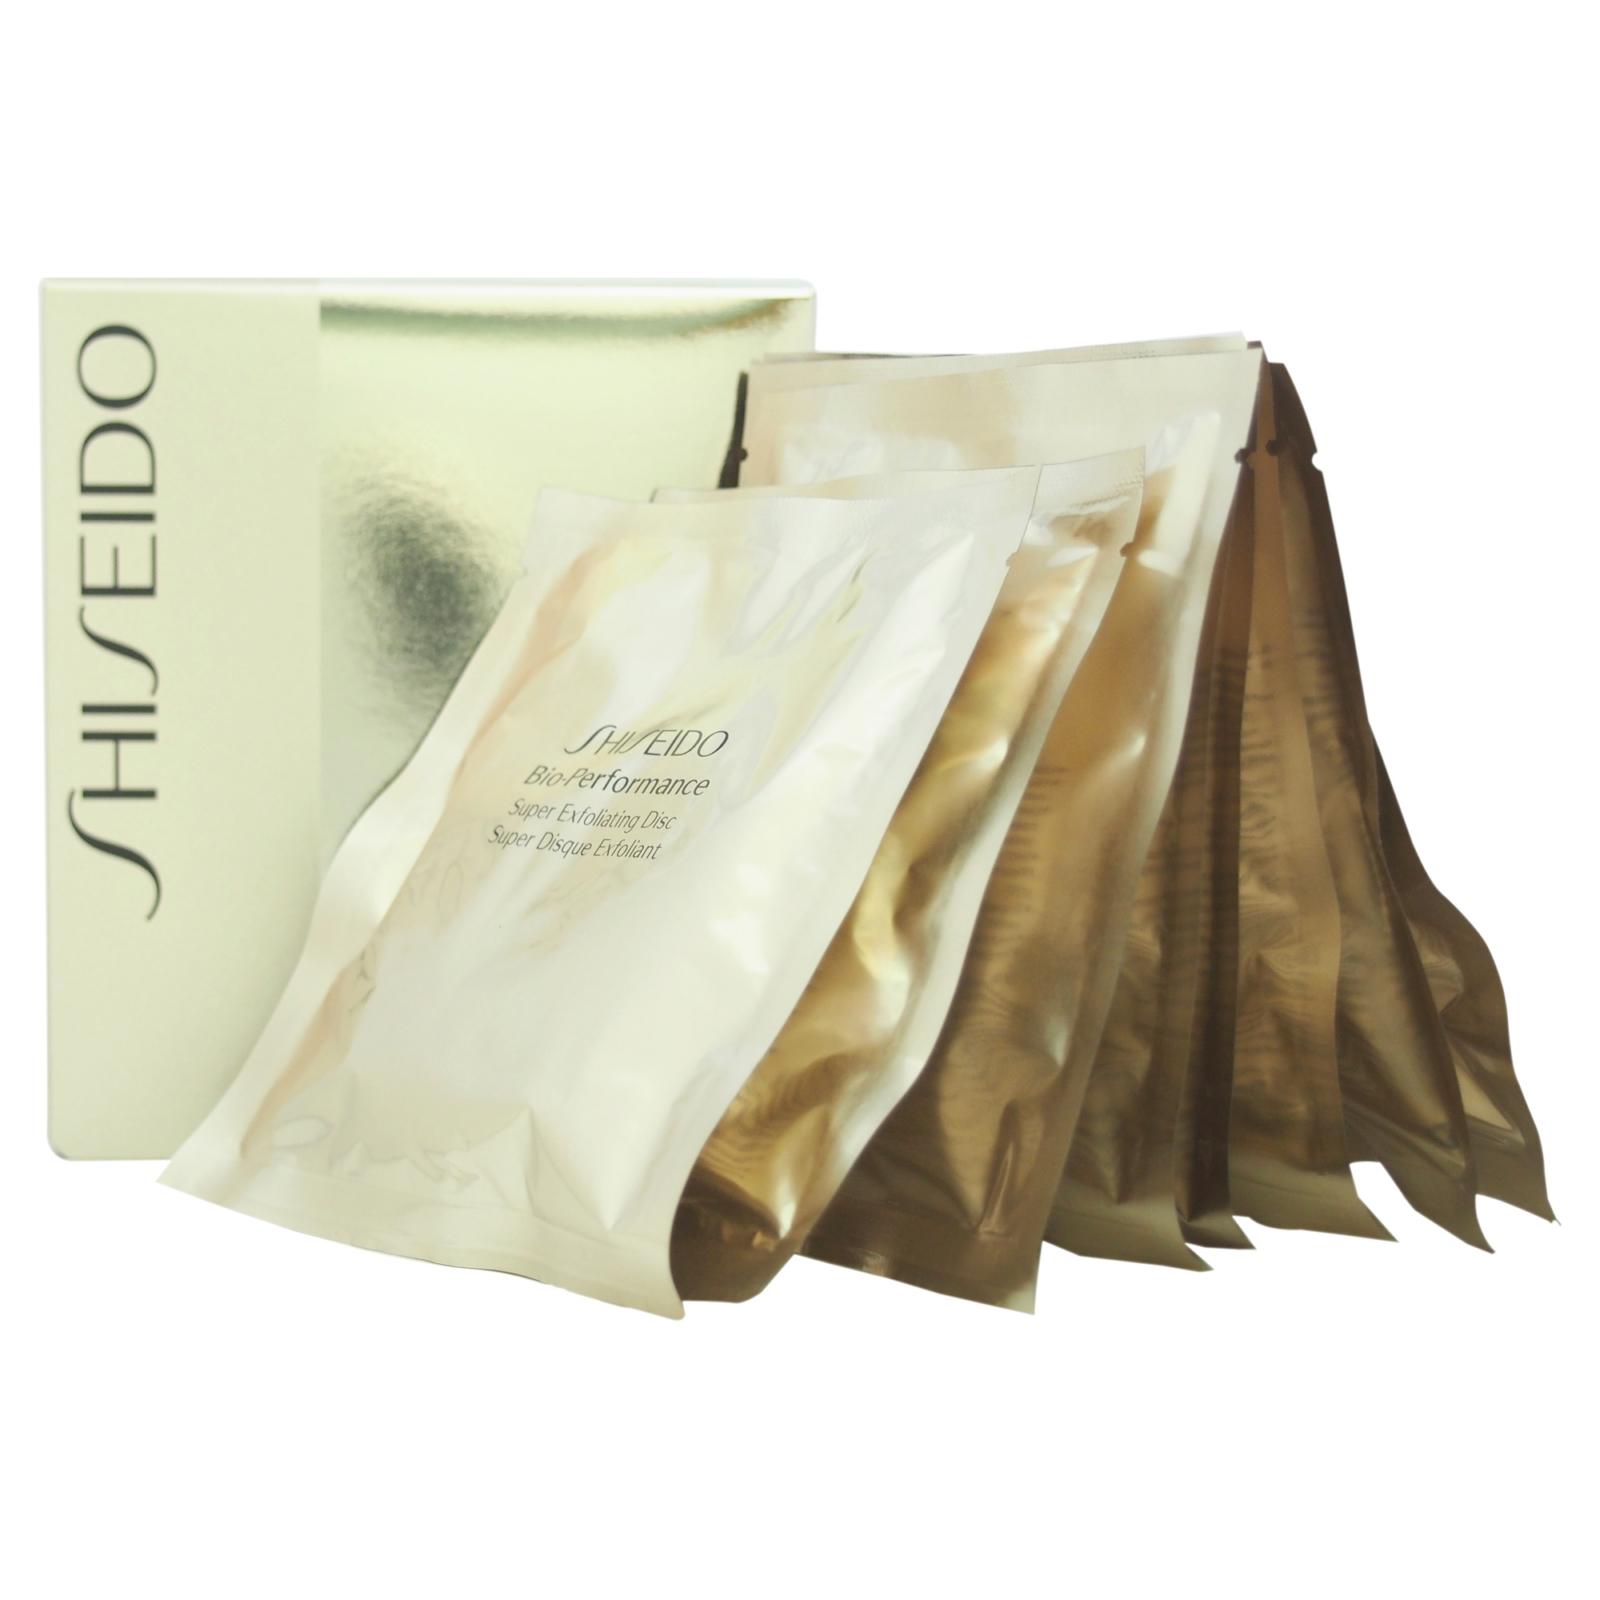 Shiseido Bio Performance Exfoliating Discs--8discs PartNumber: 07404593000P